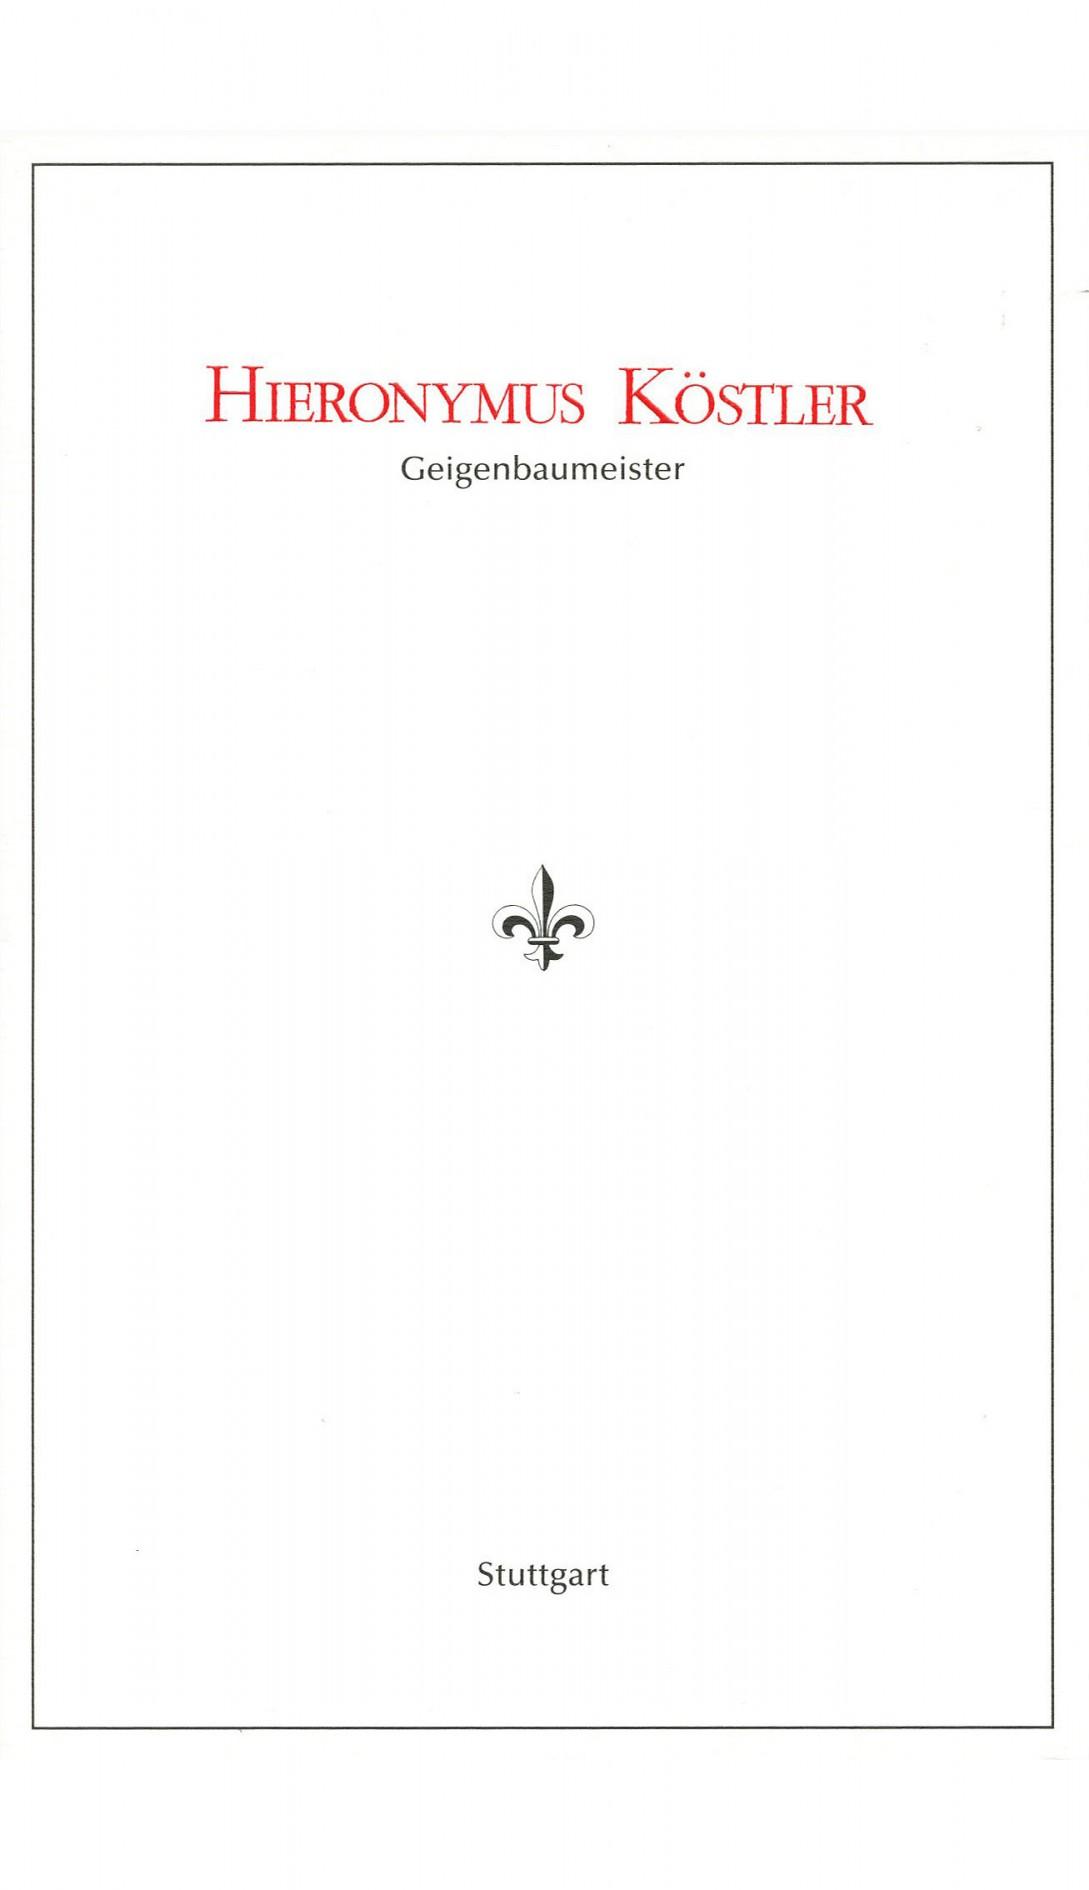 Expert certificate by Hieronymus Köstler